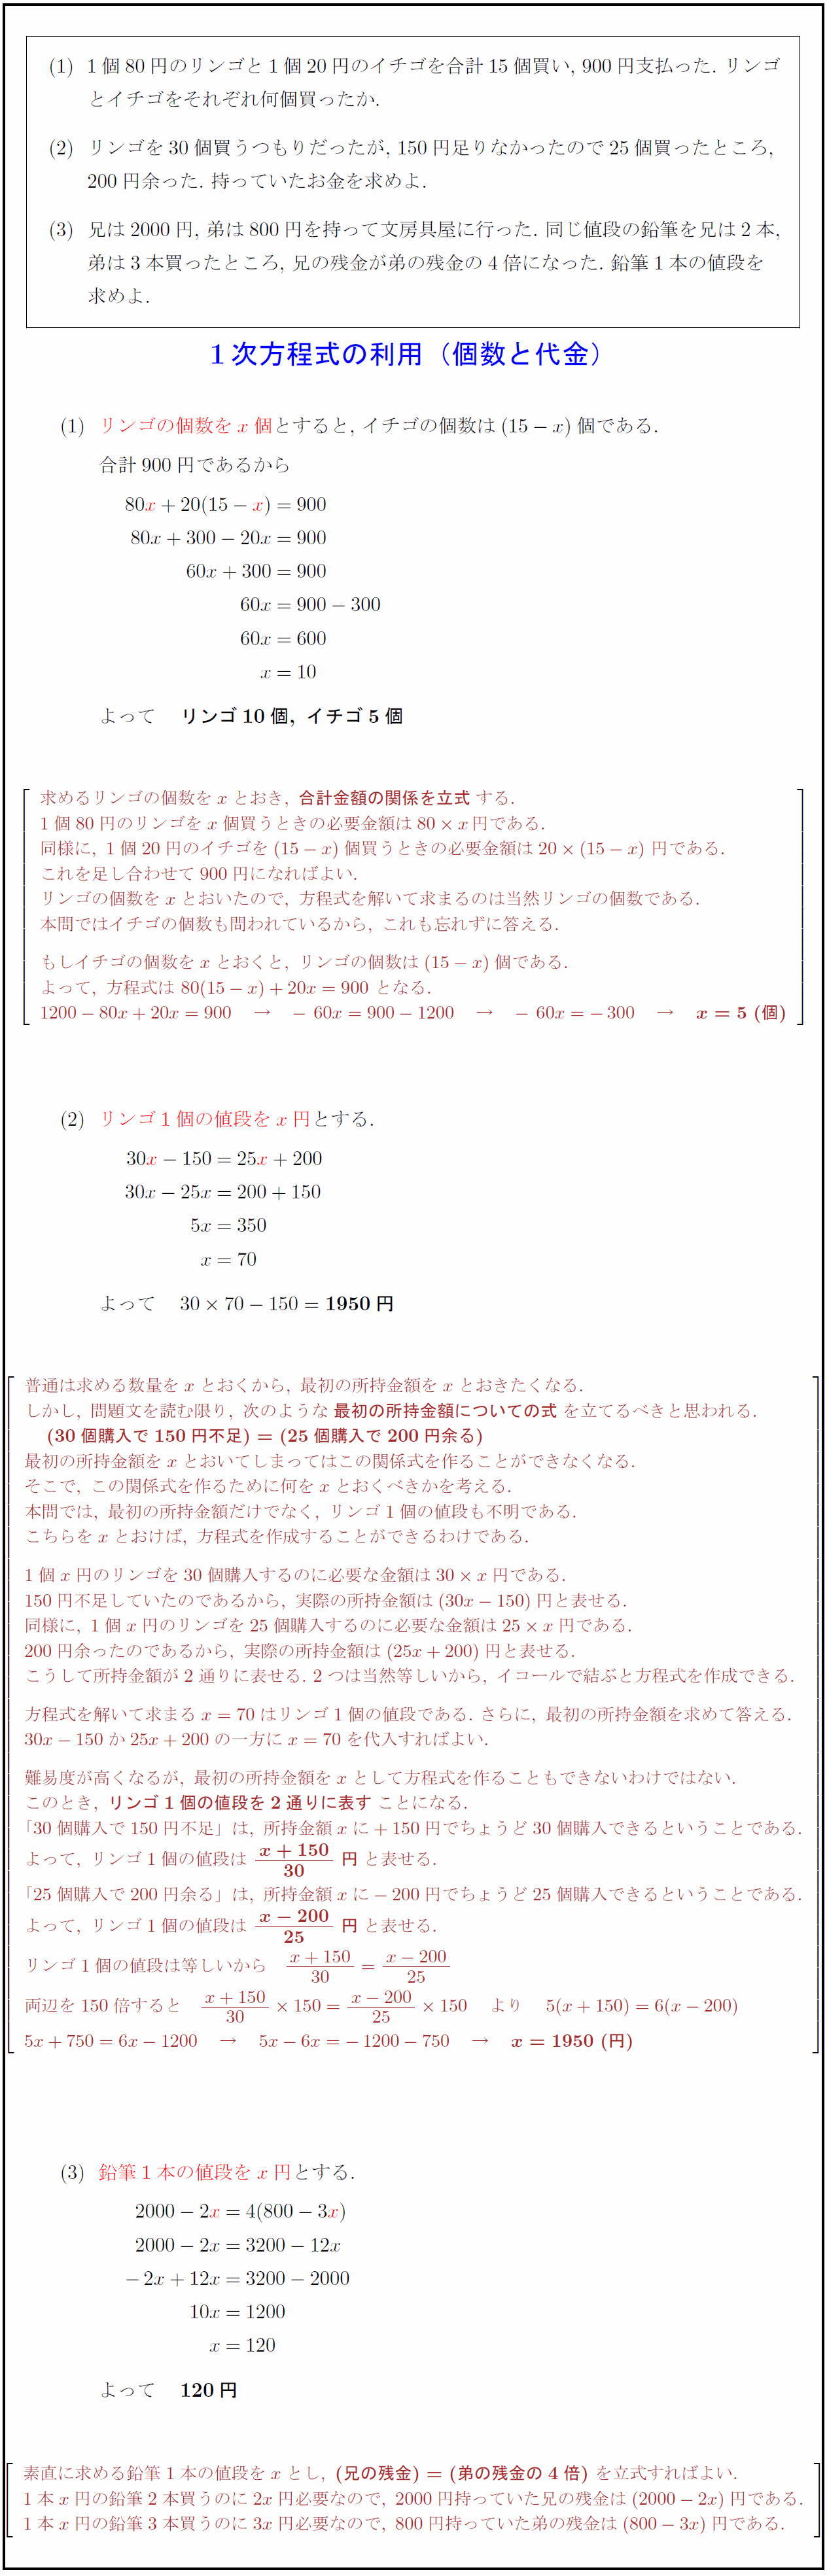 itijihouteisiki-daikin@2x